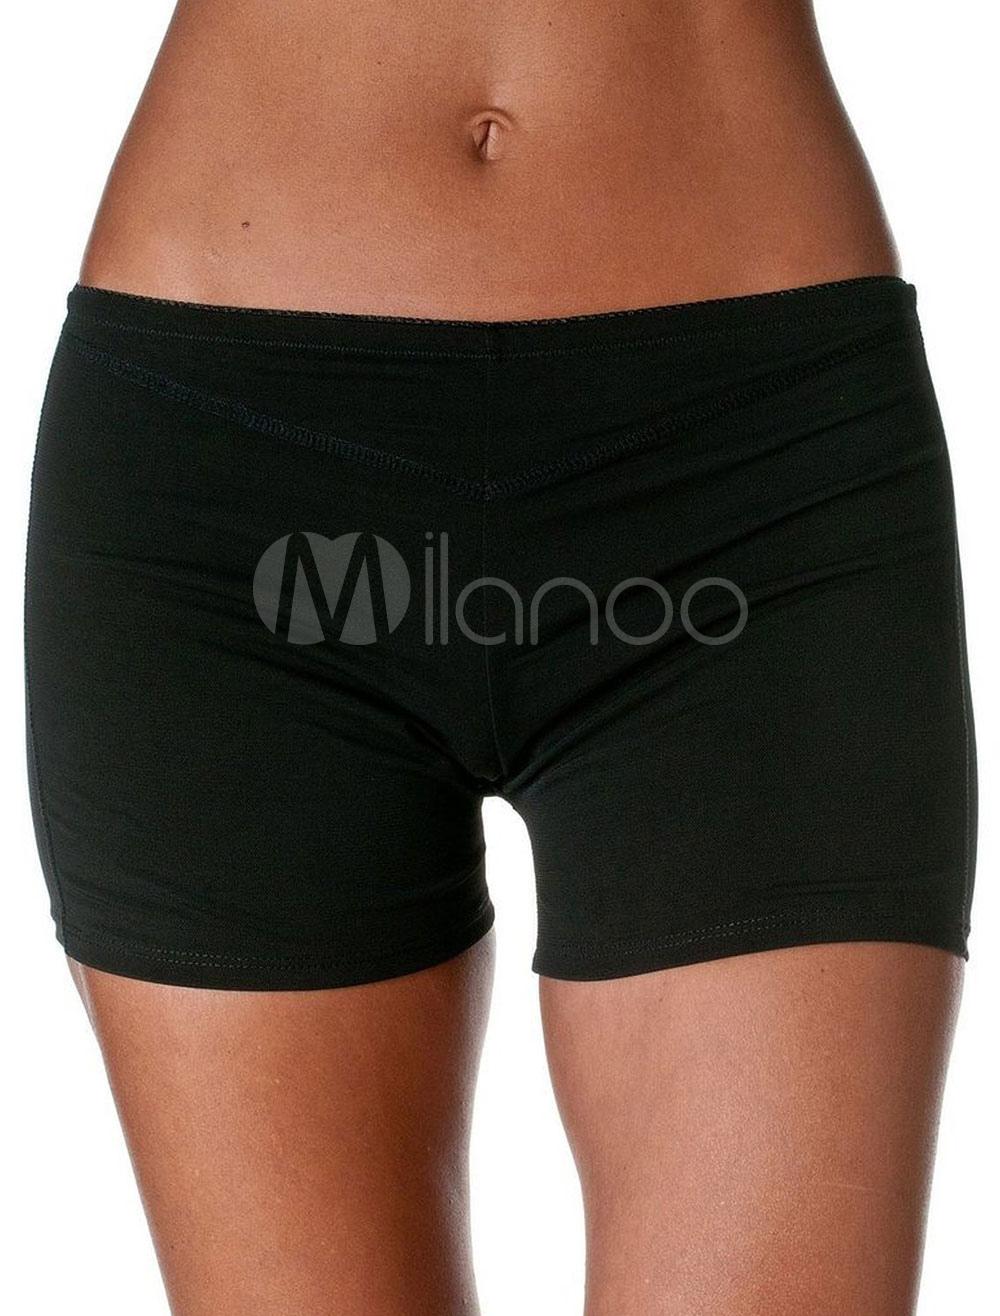 Women's Shapewear Underwear Black Butt Lifting Control Panty Cheap clothes, free shipping worldwide